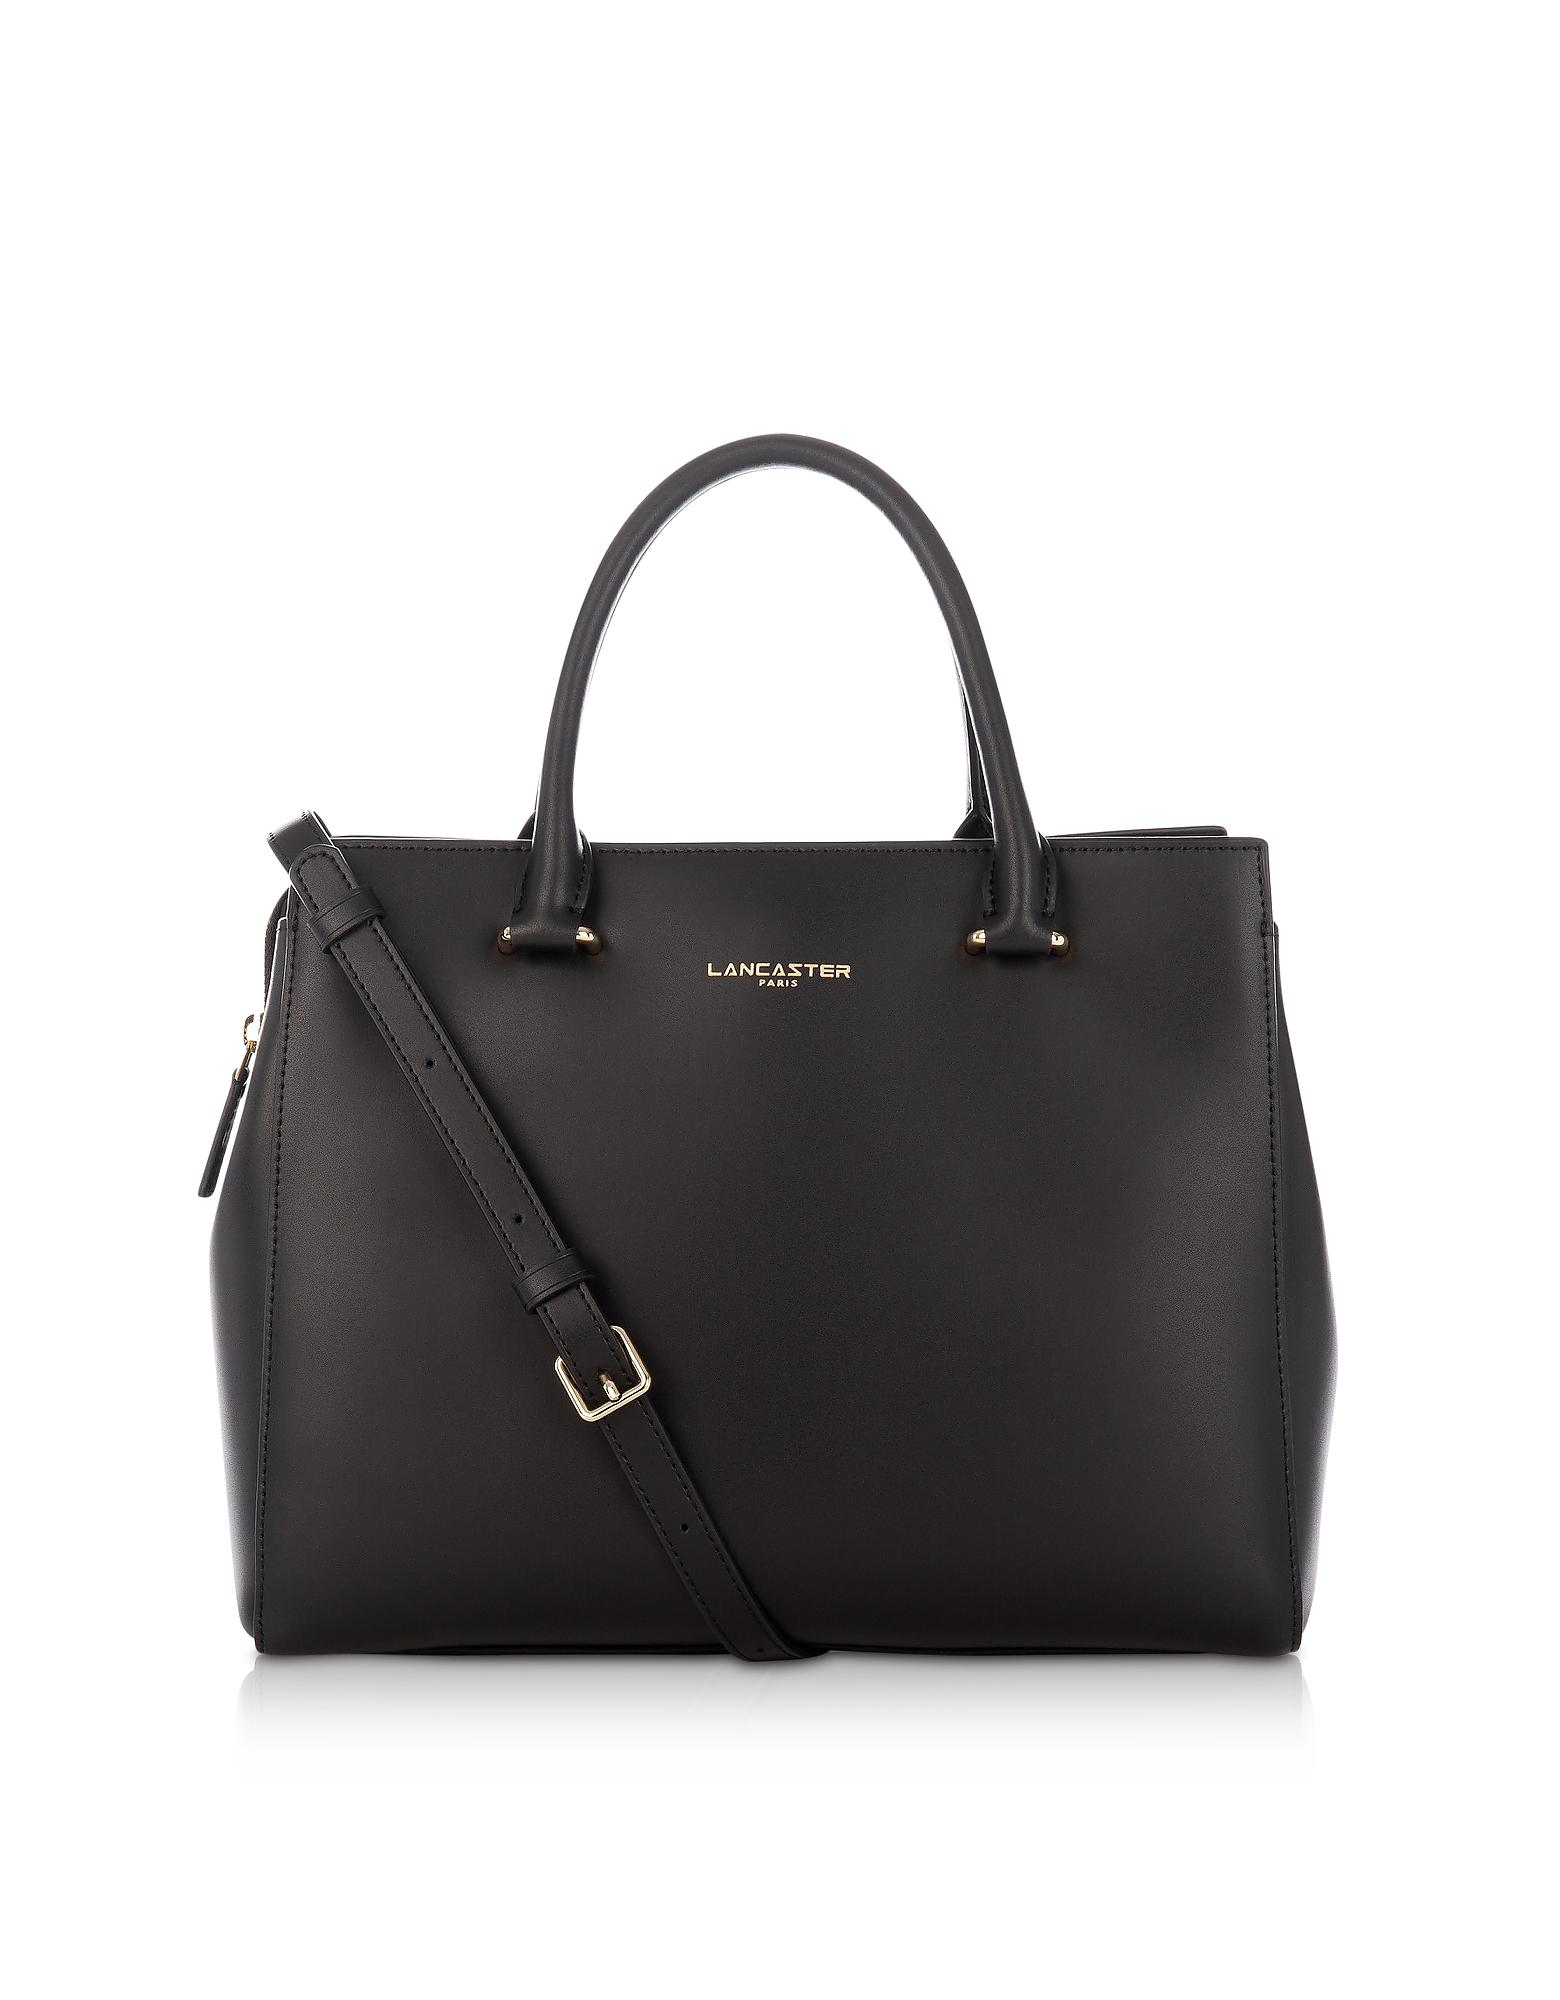 2ccbe07c2311 Lancaster Paris Camelia Smooth Leather Top Handle Satchel Bag in ...